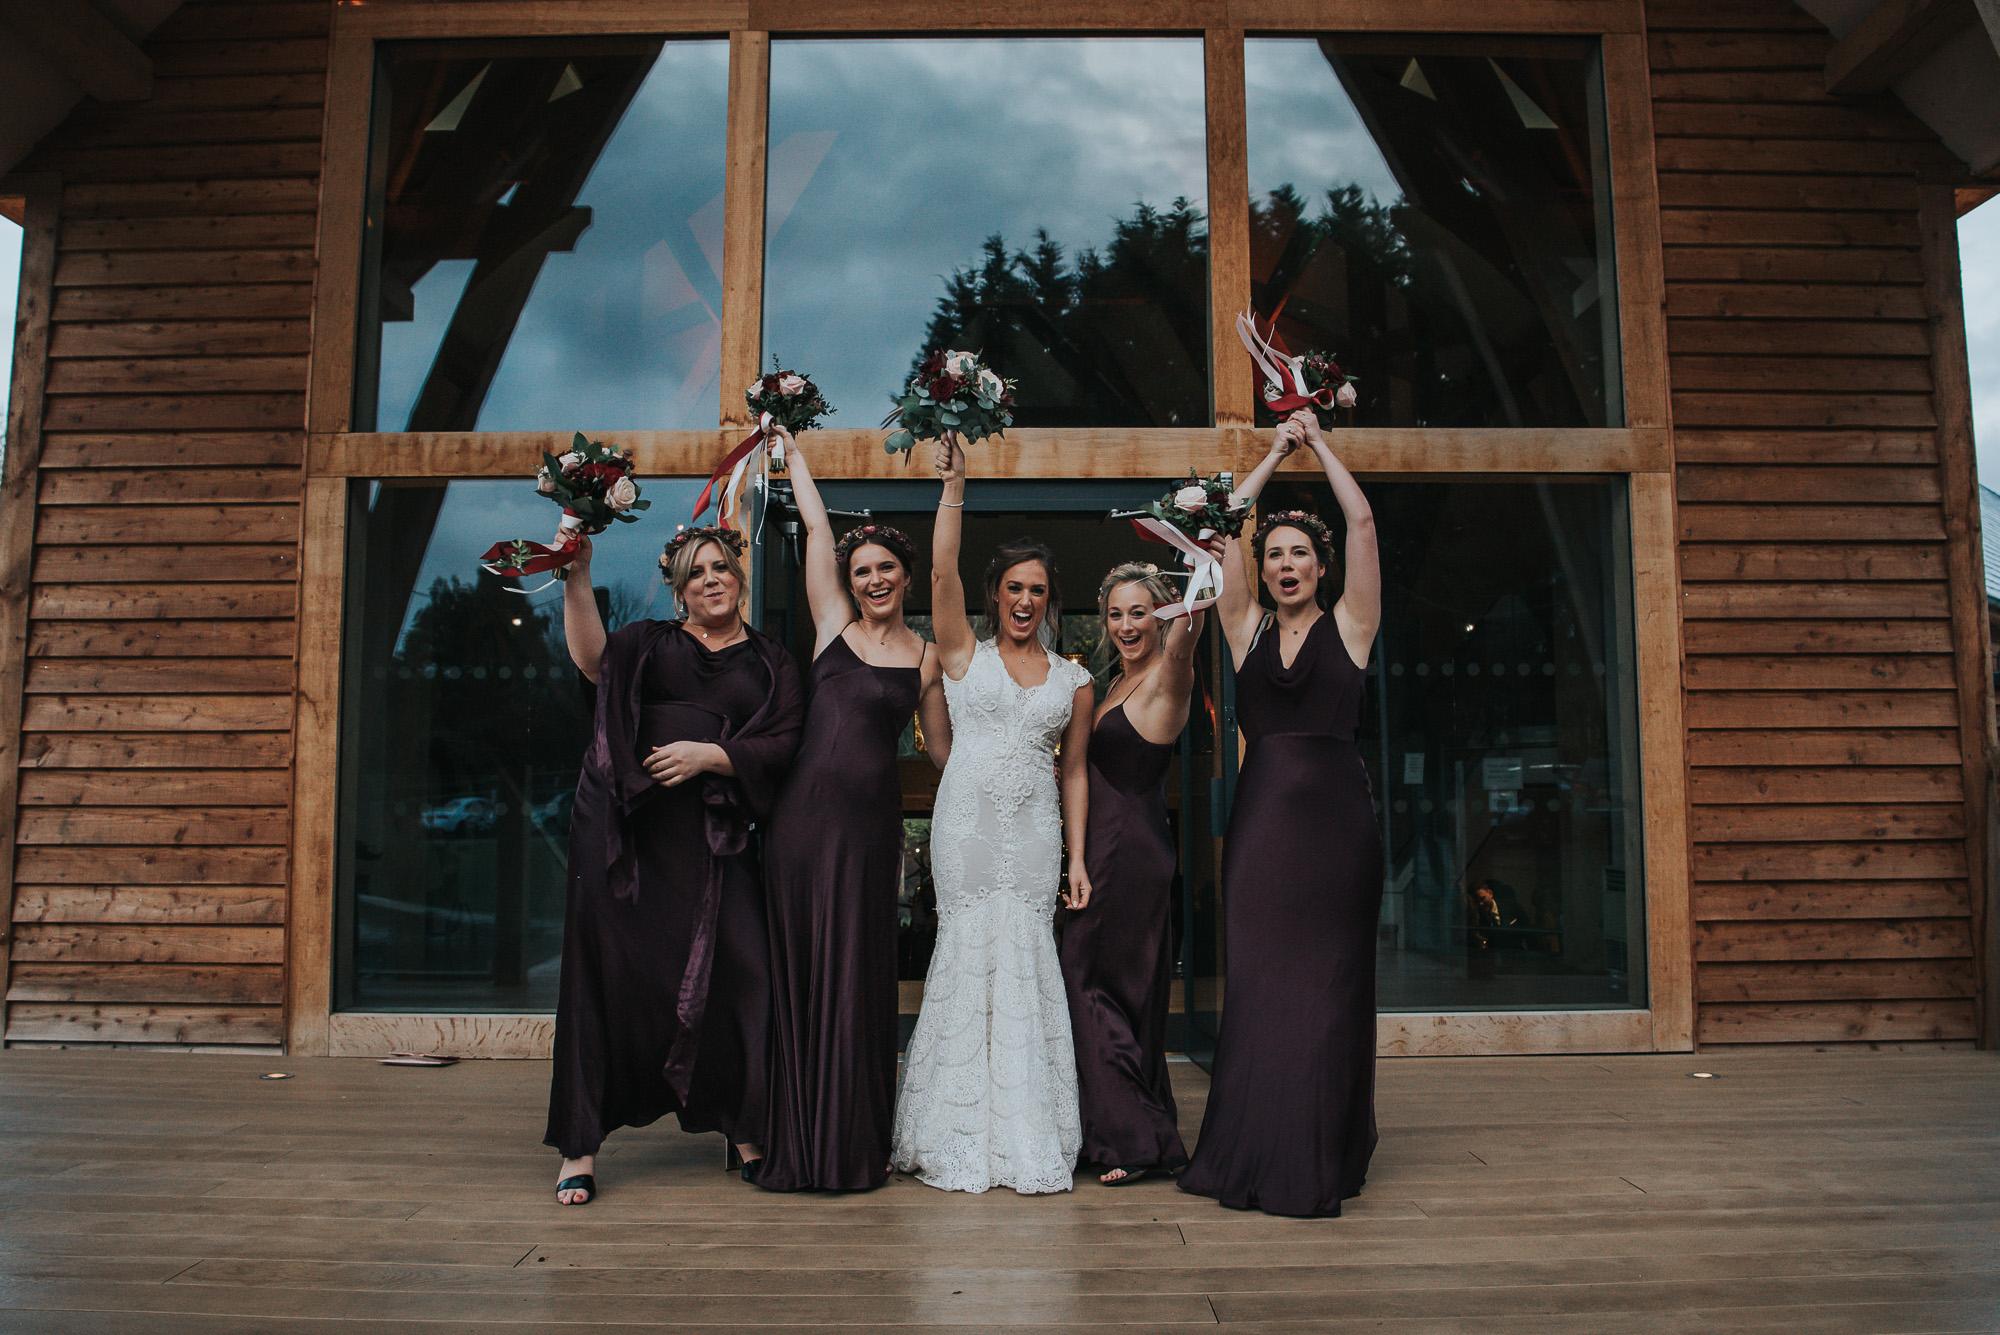 The Mill Barns Wedding Photographer Shropshire (28 of 40).jpg